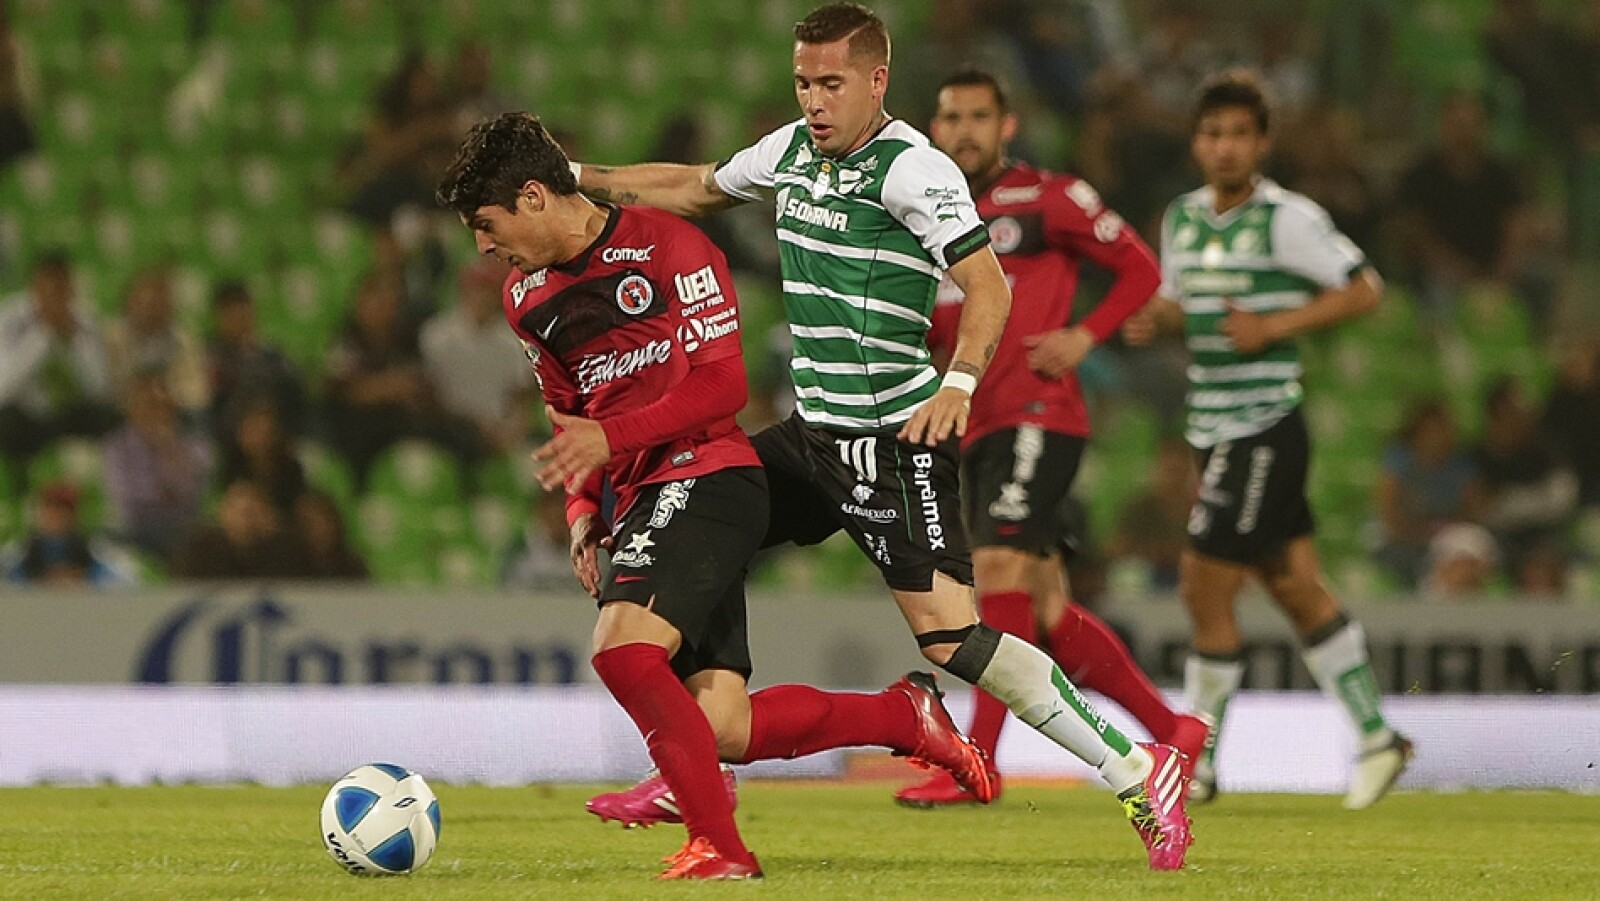 Santos sufrió pero venció 3-2 a Tijuana con goles de tres jugadores distintos